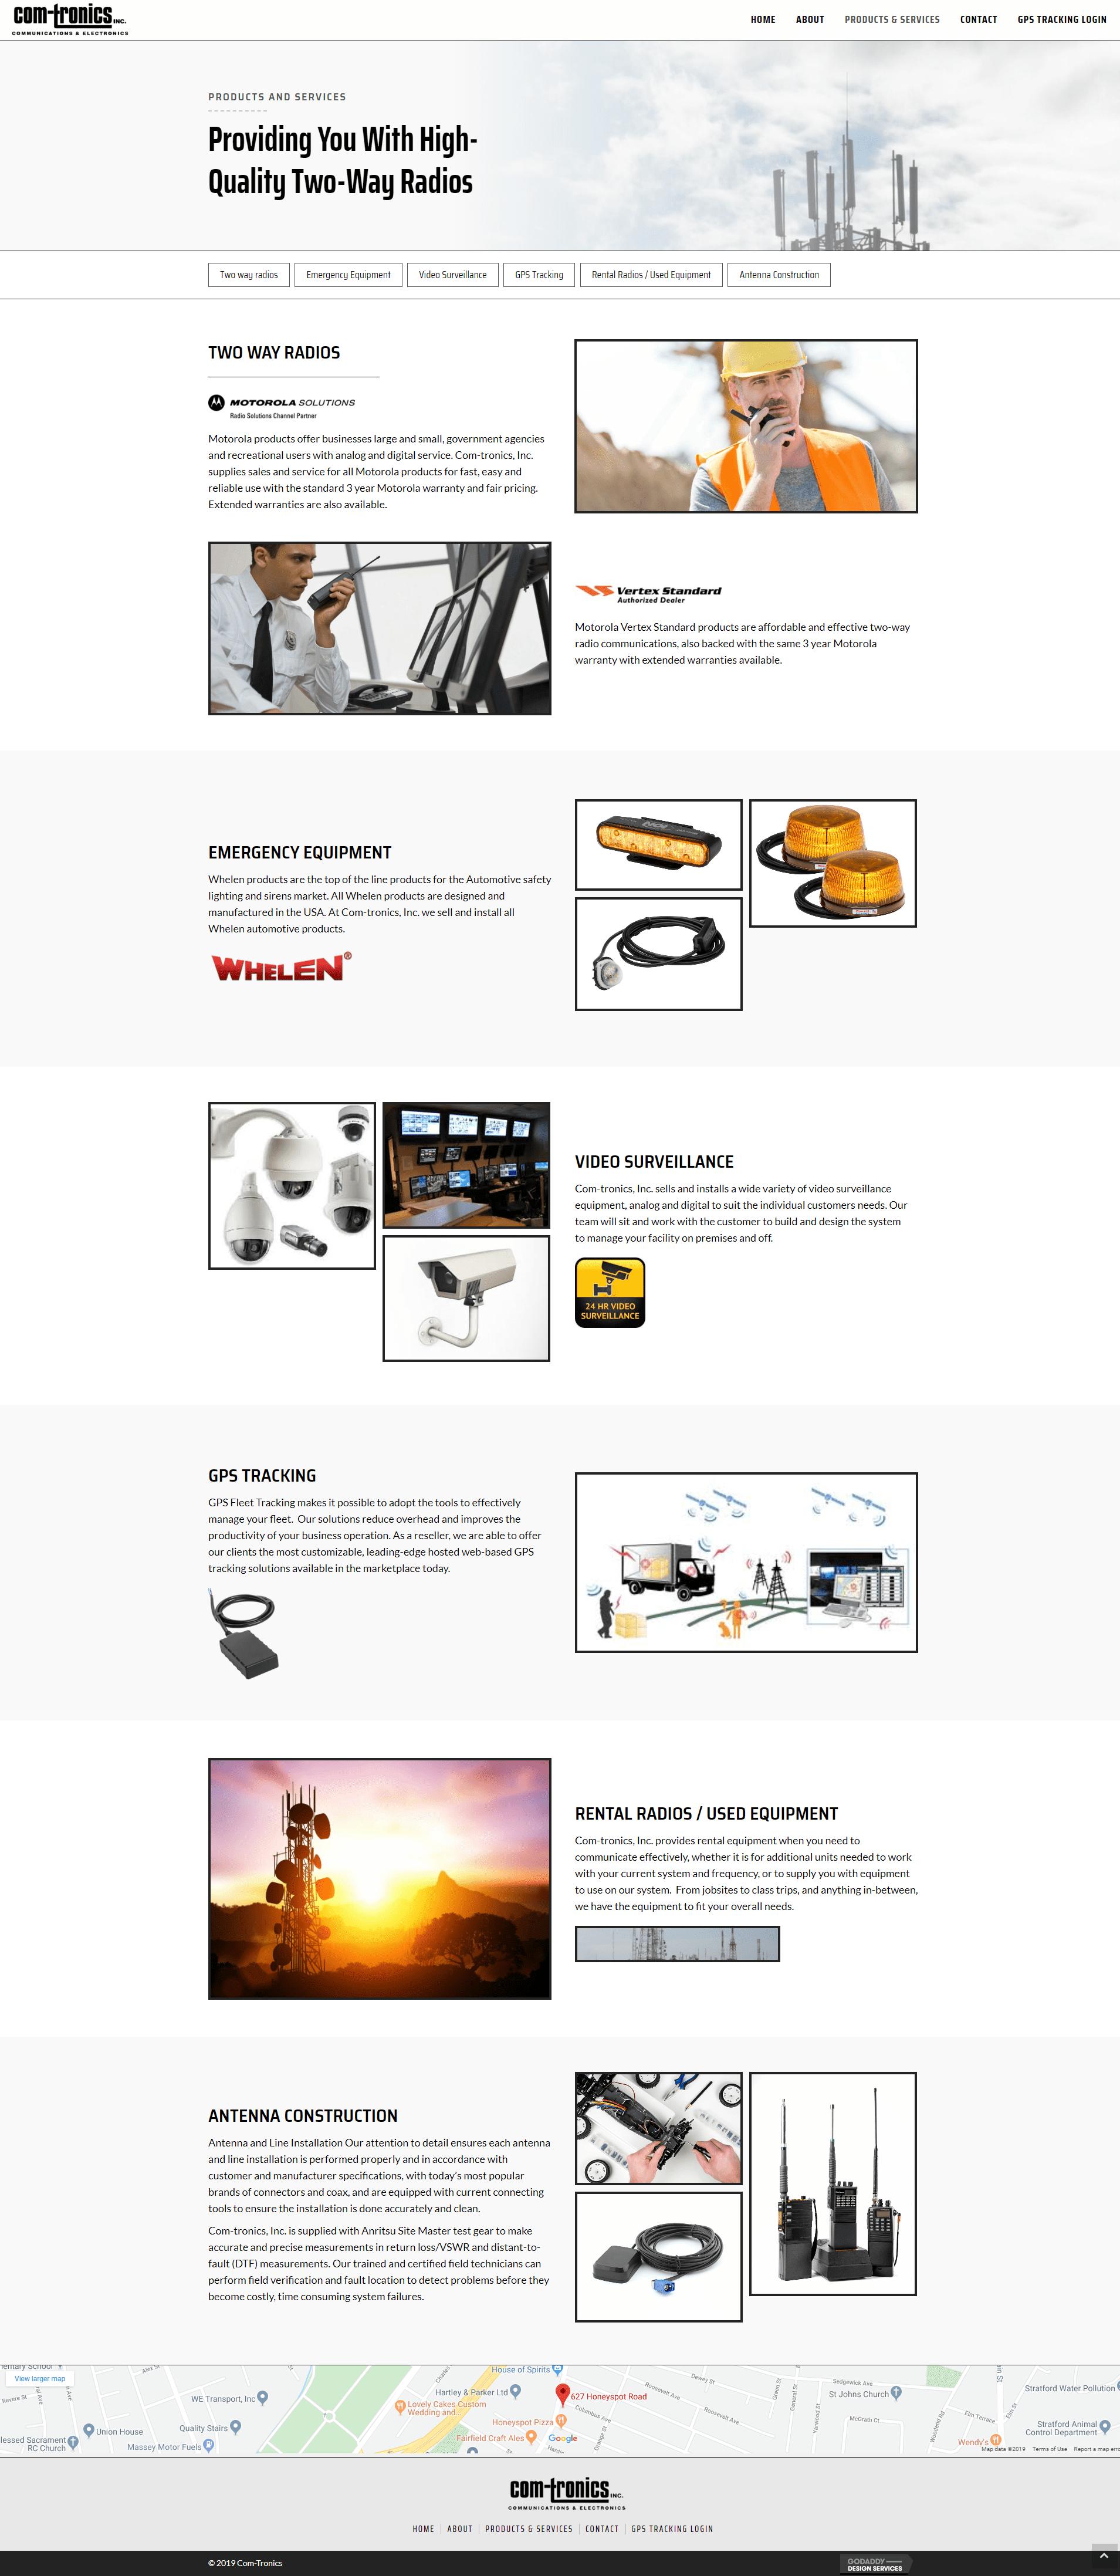 Com-Tronics - products services after QA